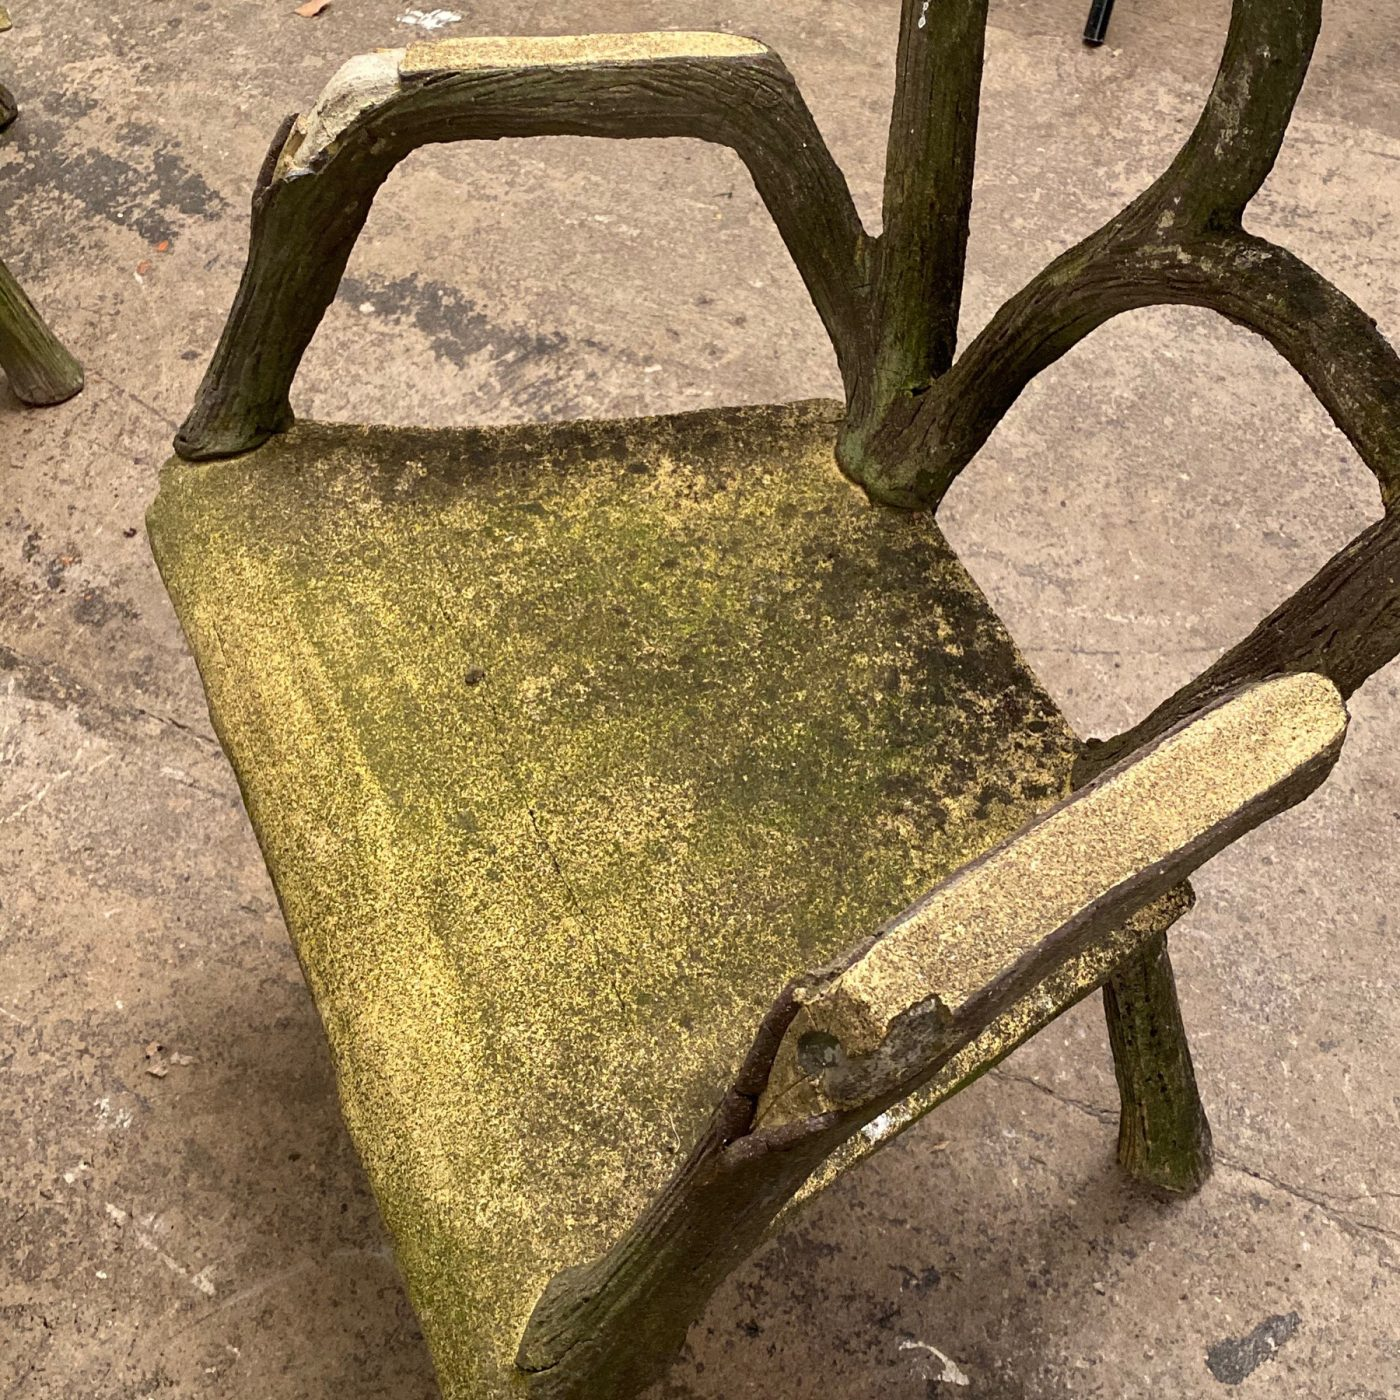 objet-vagabond-garden-set0008